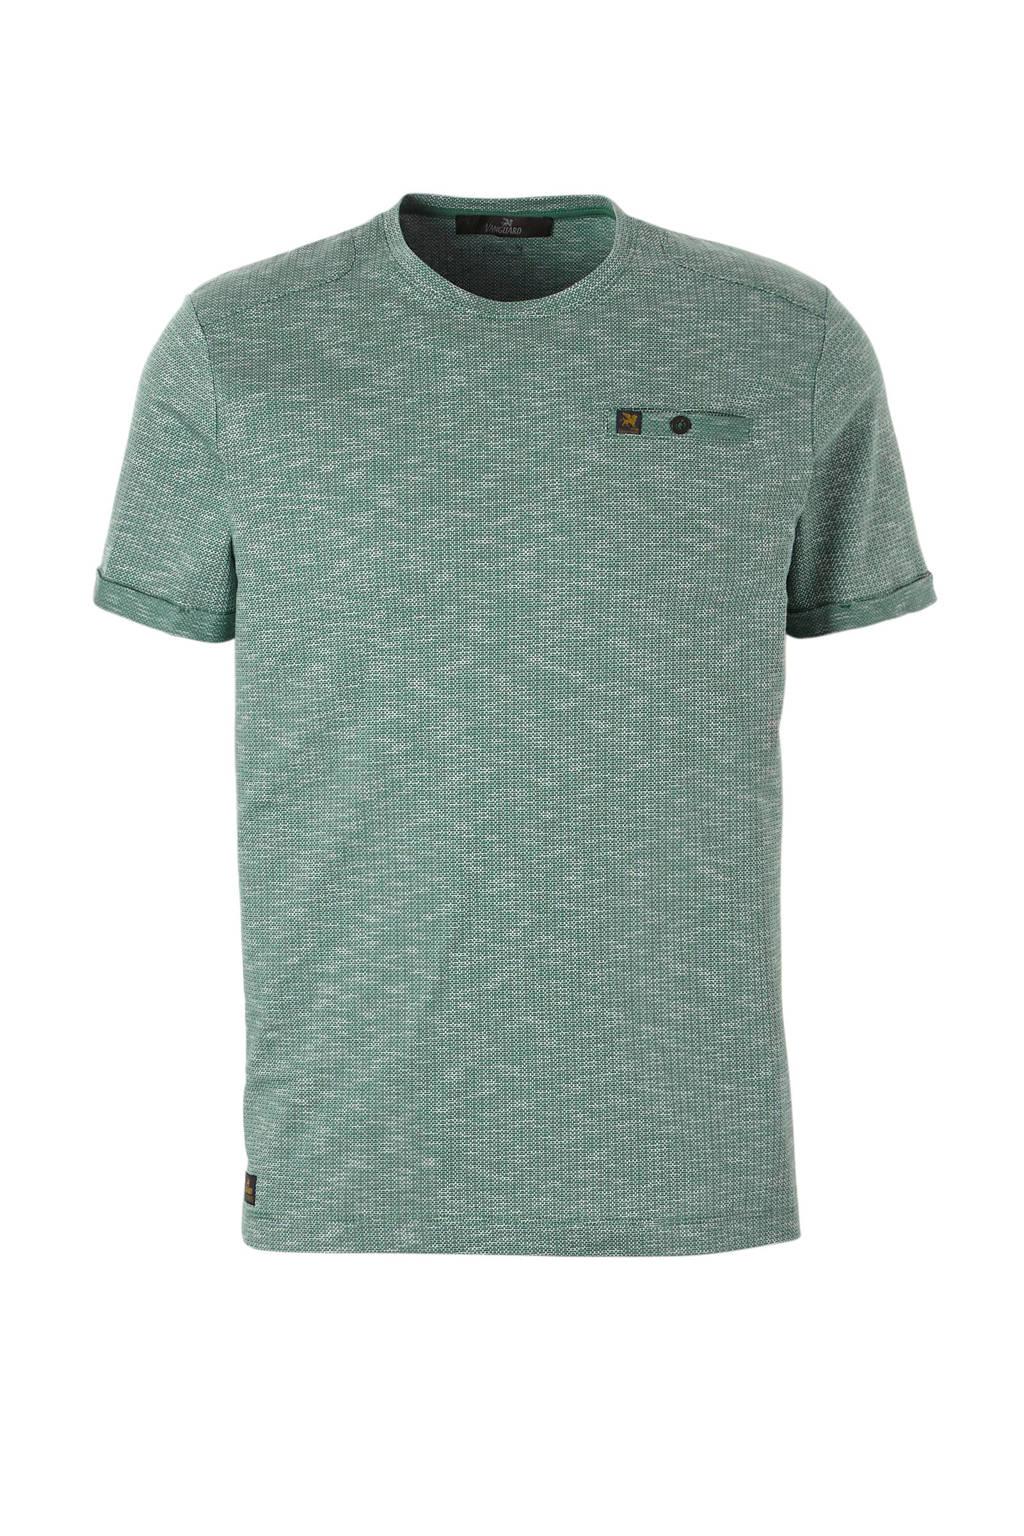 Vanguard T-shirt groen, Groen/ wit